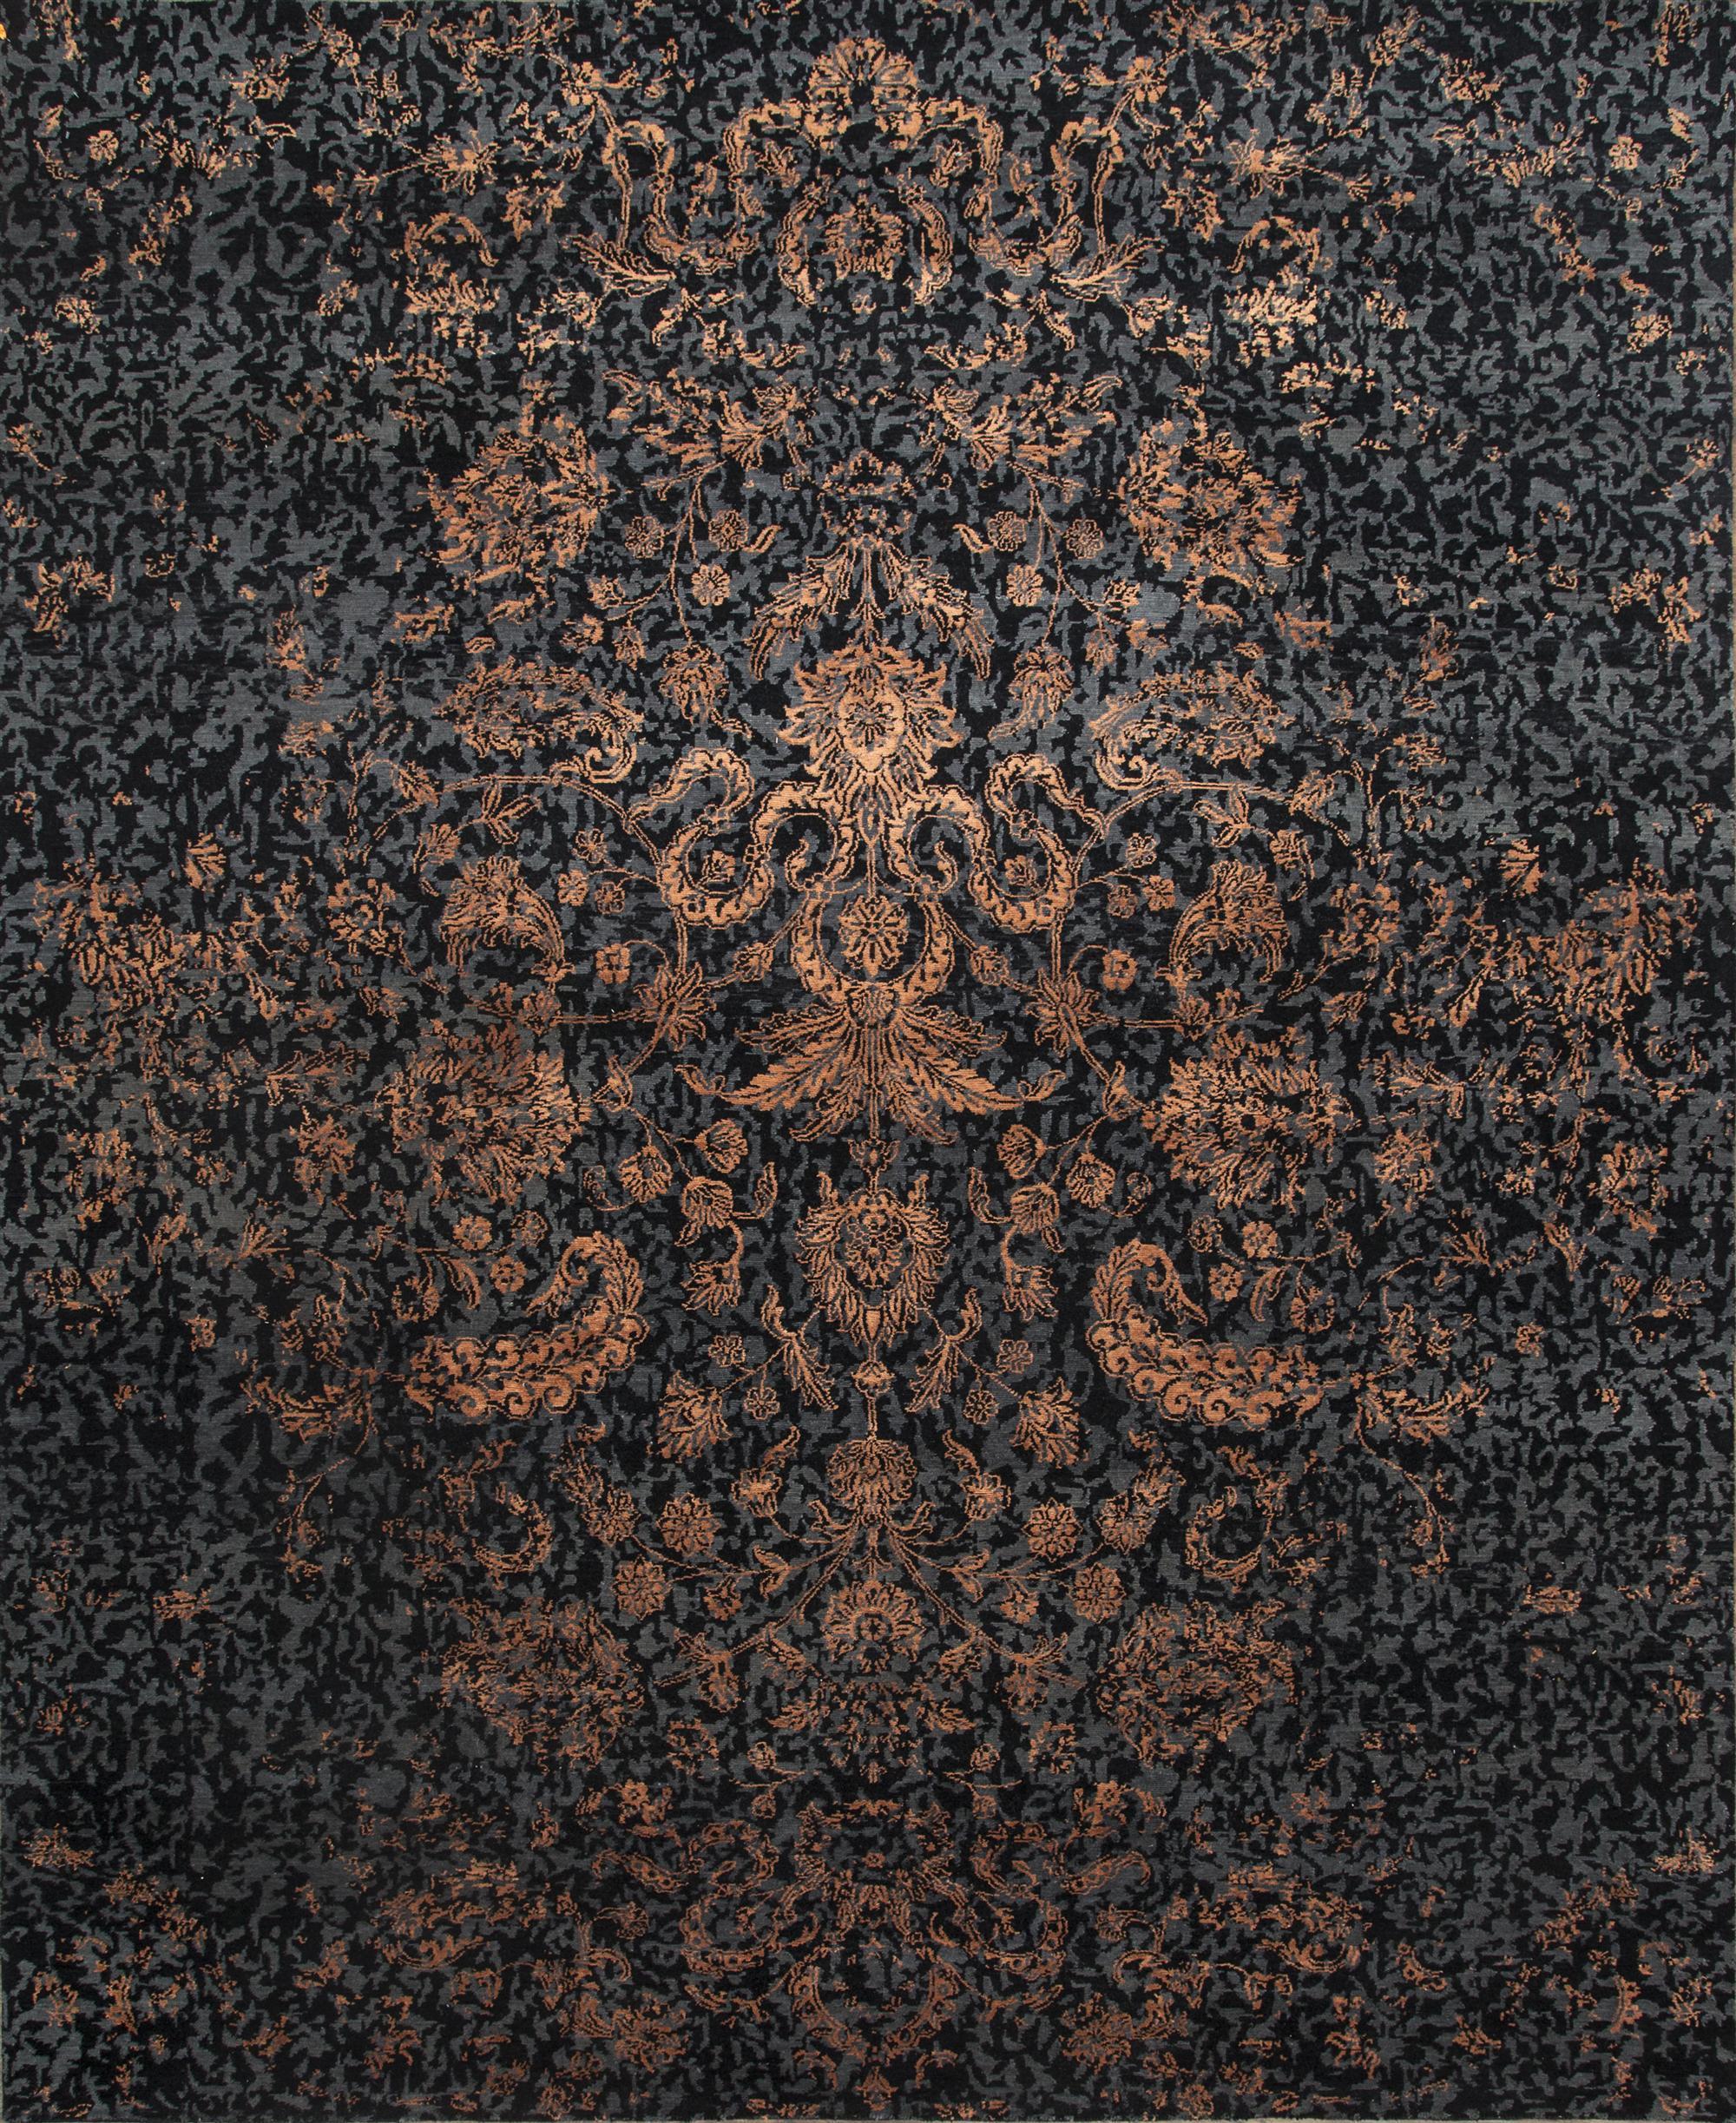 Erased Heritage 8' x 10' Handmade Area Rug - Shabahang Royal Carpet